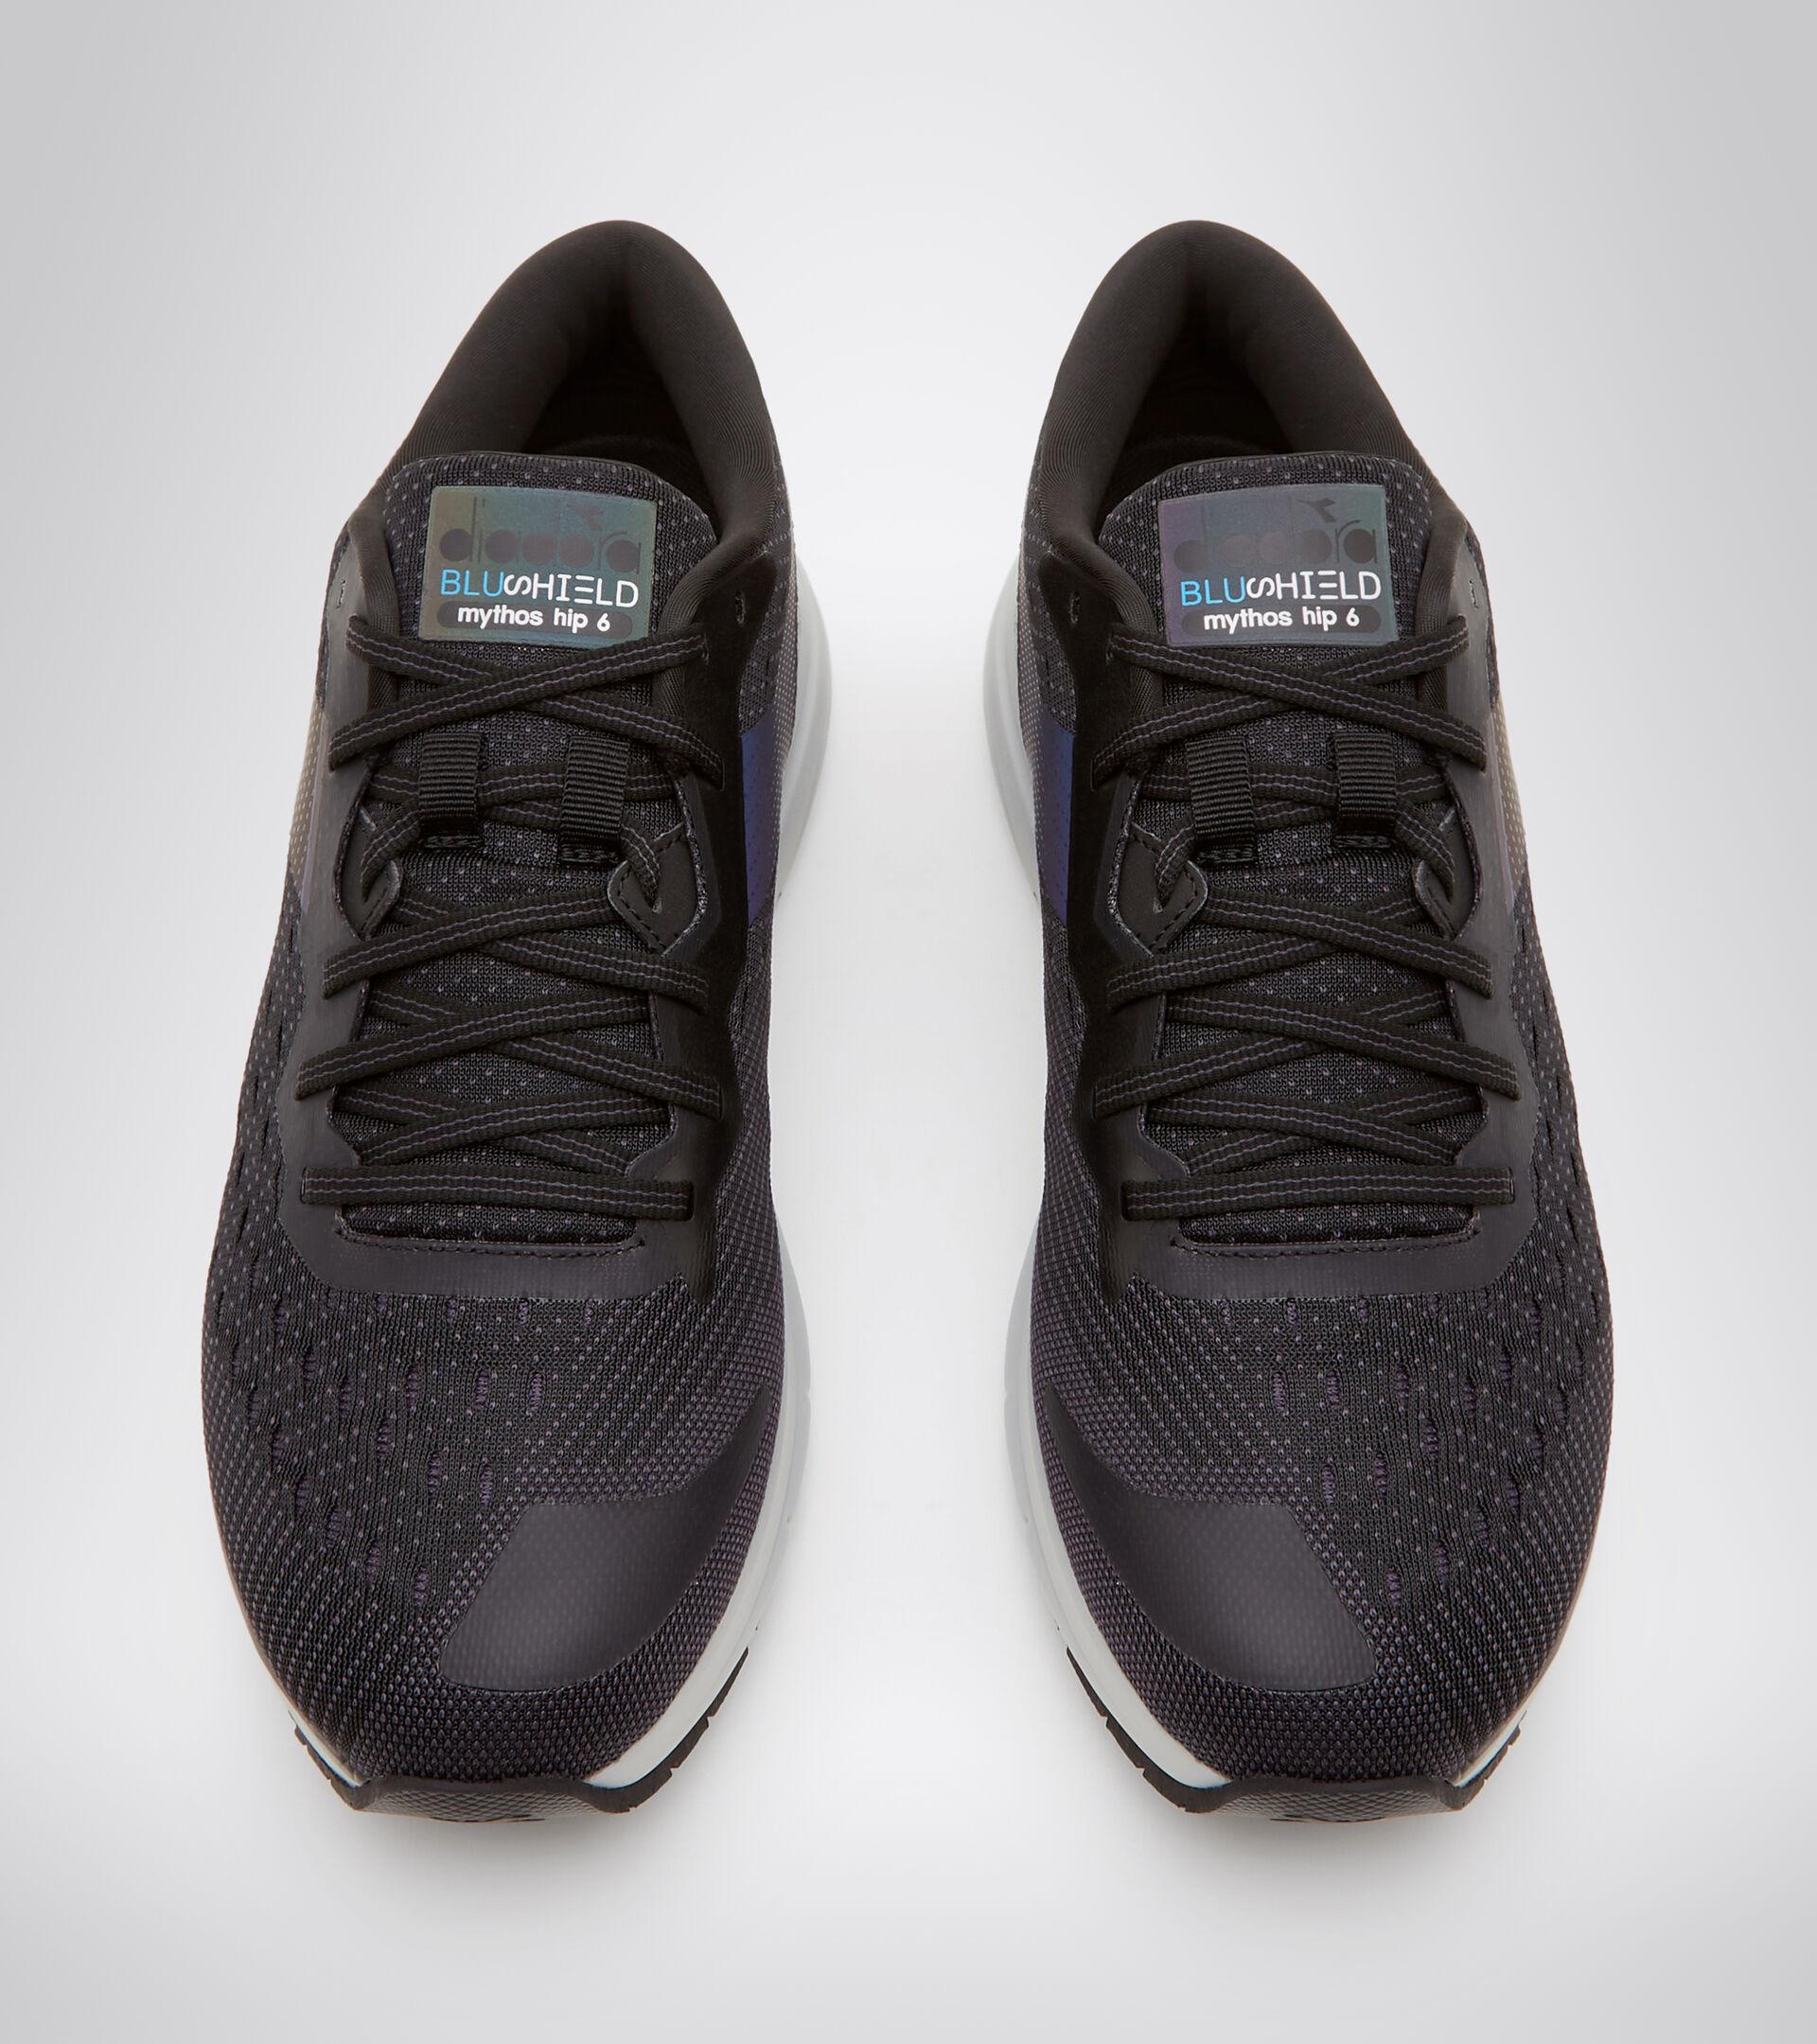 Footwear Sport UOMO MYTHOS BLUSHIELD HIP 6 NERO/NERO FUMO Diadora